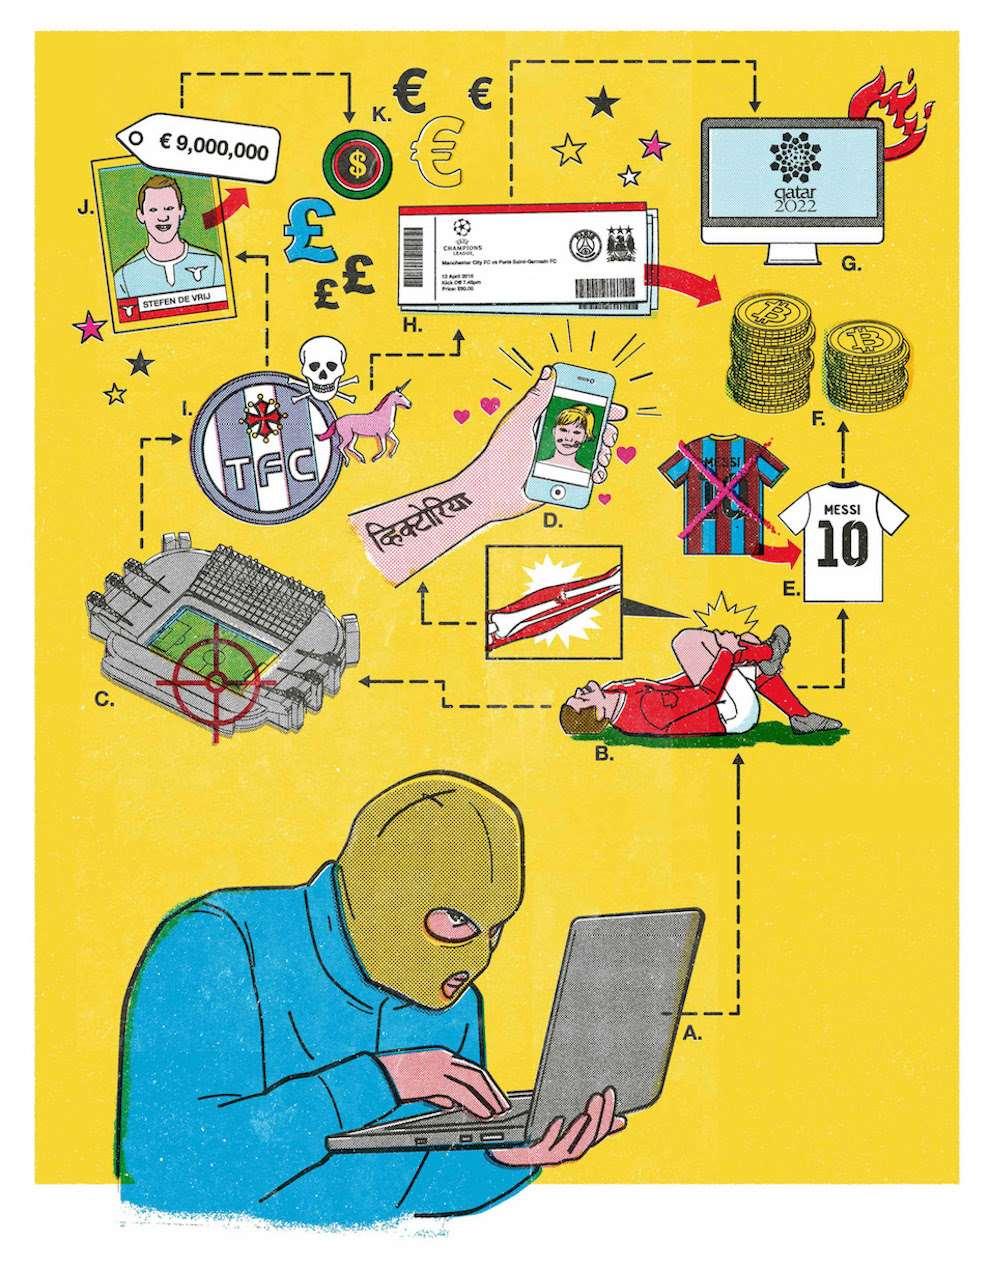 Tobatron, humorous infographic illustration